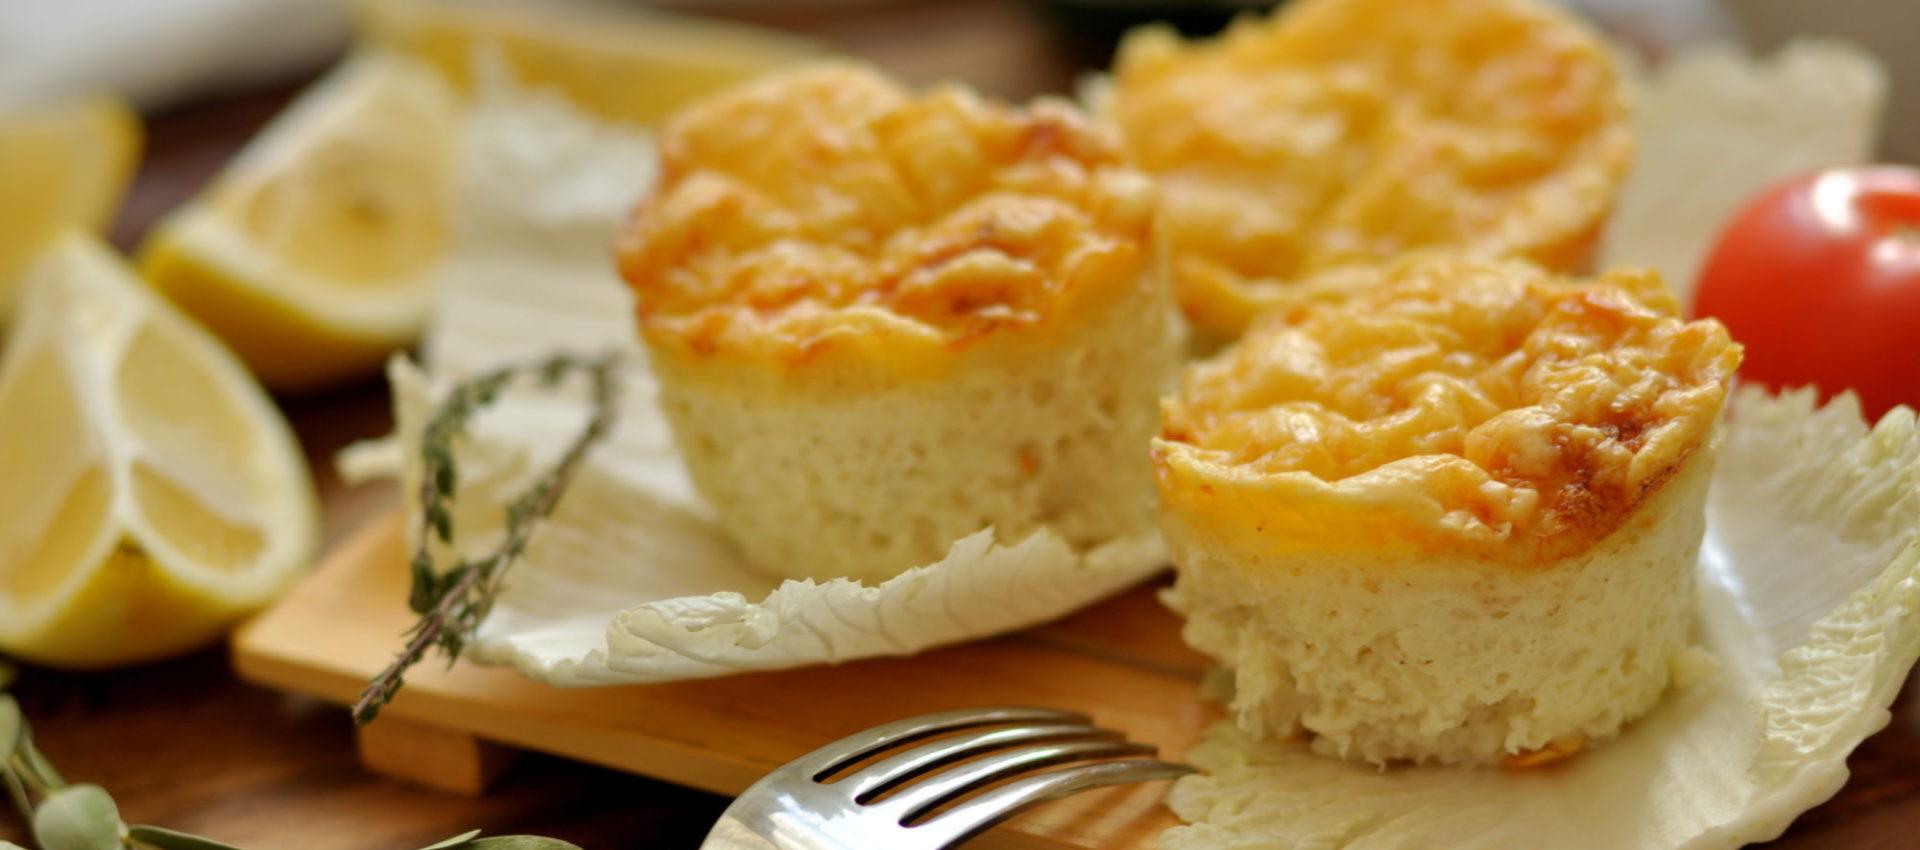 Рыбное суфле в меню при панкреатите и холецистите